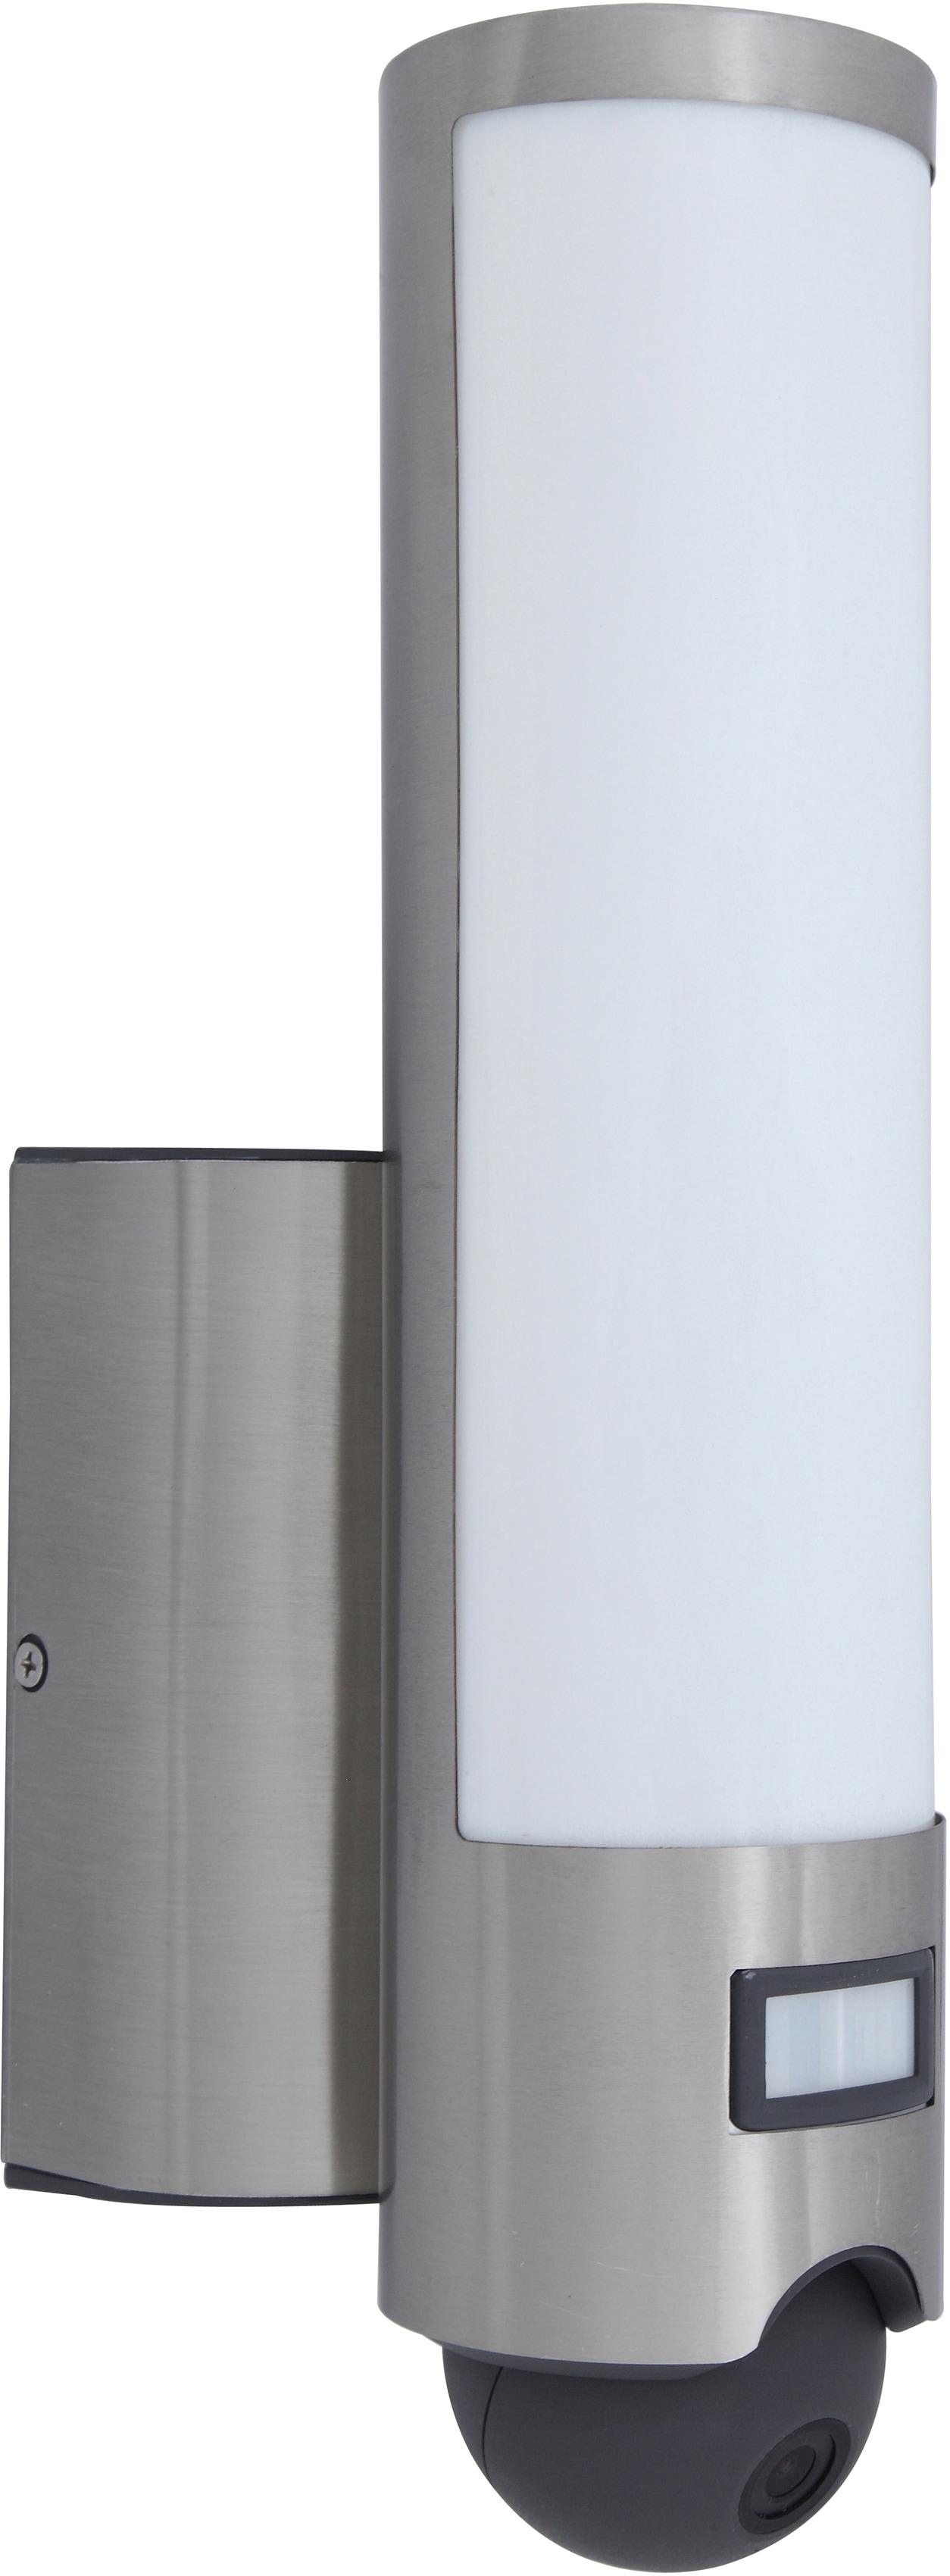 LUTEC LED Außen-Wandleuchte ELARA HD ST2671-CAM, LED-Modul, 1 St., Warmweiß, Kameraleuchte